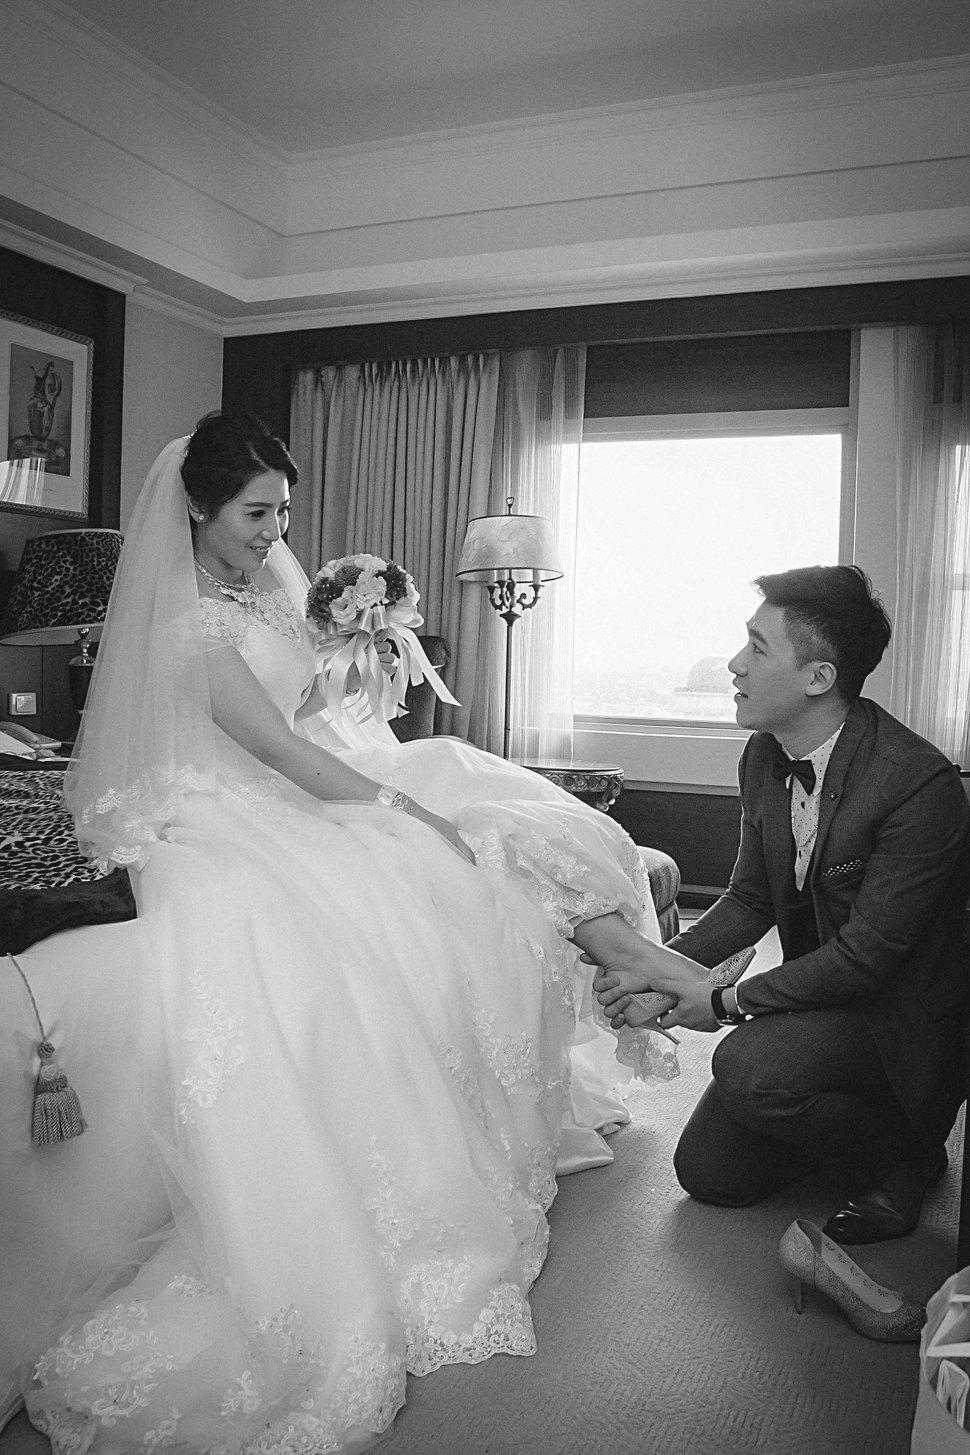 5J1Z8637 - teyesphoto - 結婚吧